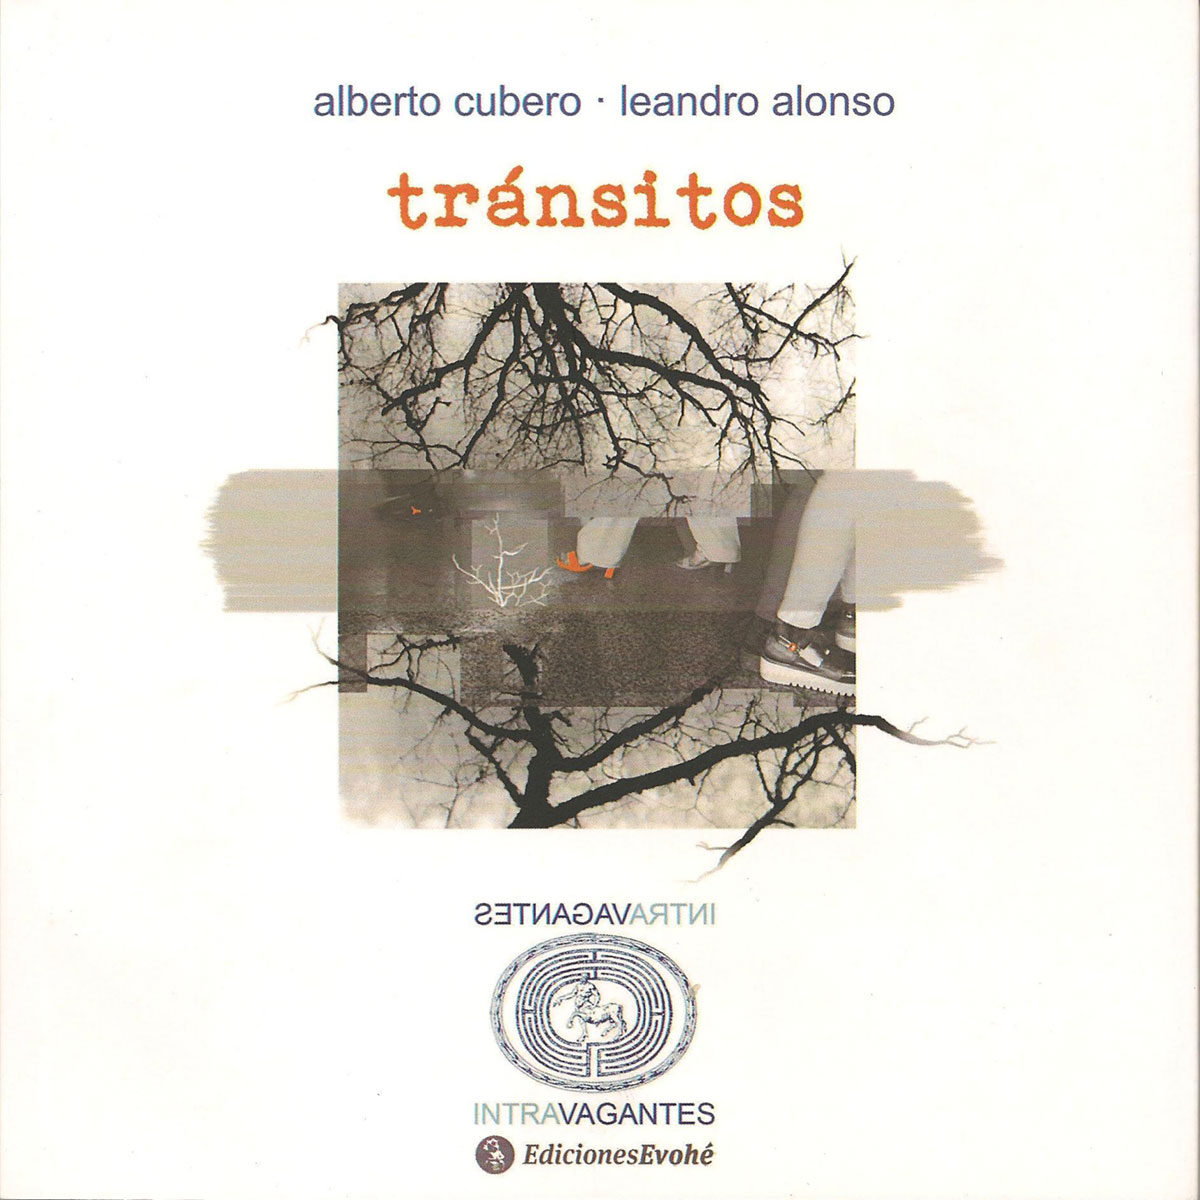 ALBERTO CUBERO + LEANDRO ALONSO - Tránsitos.